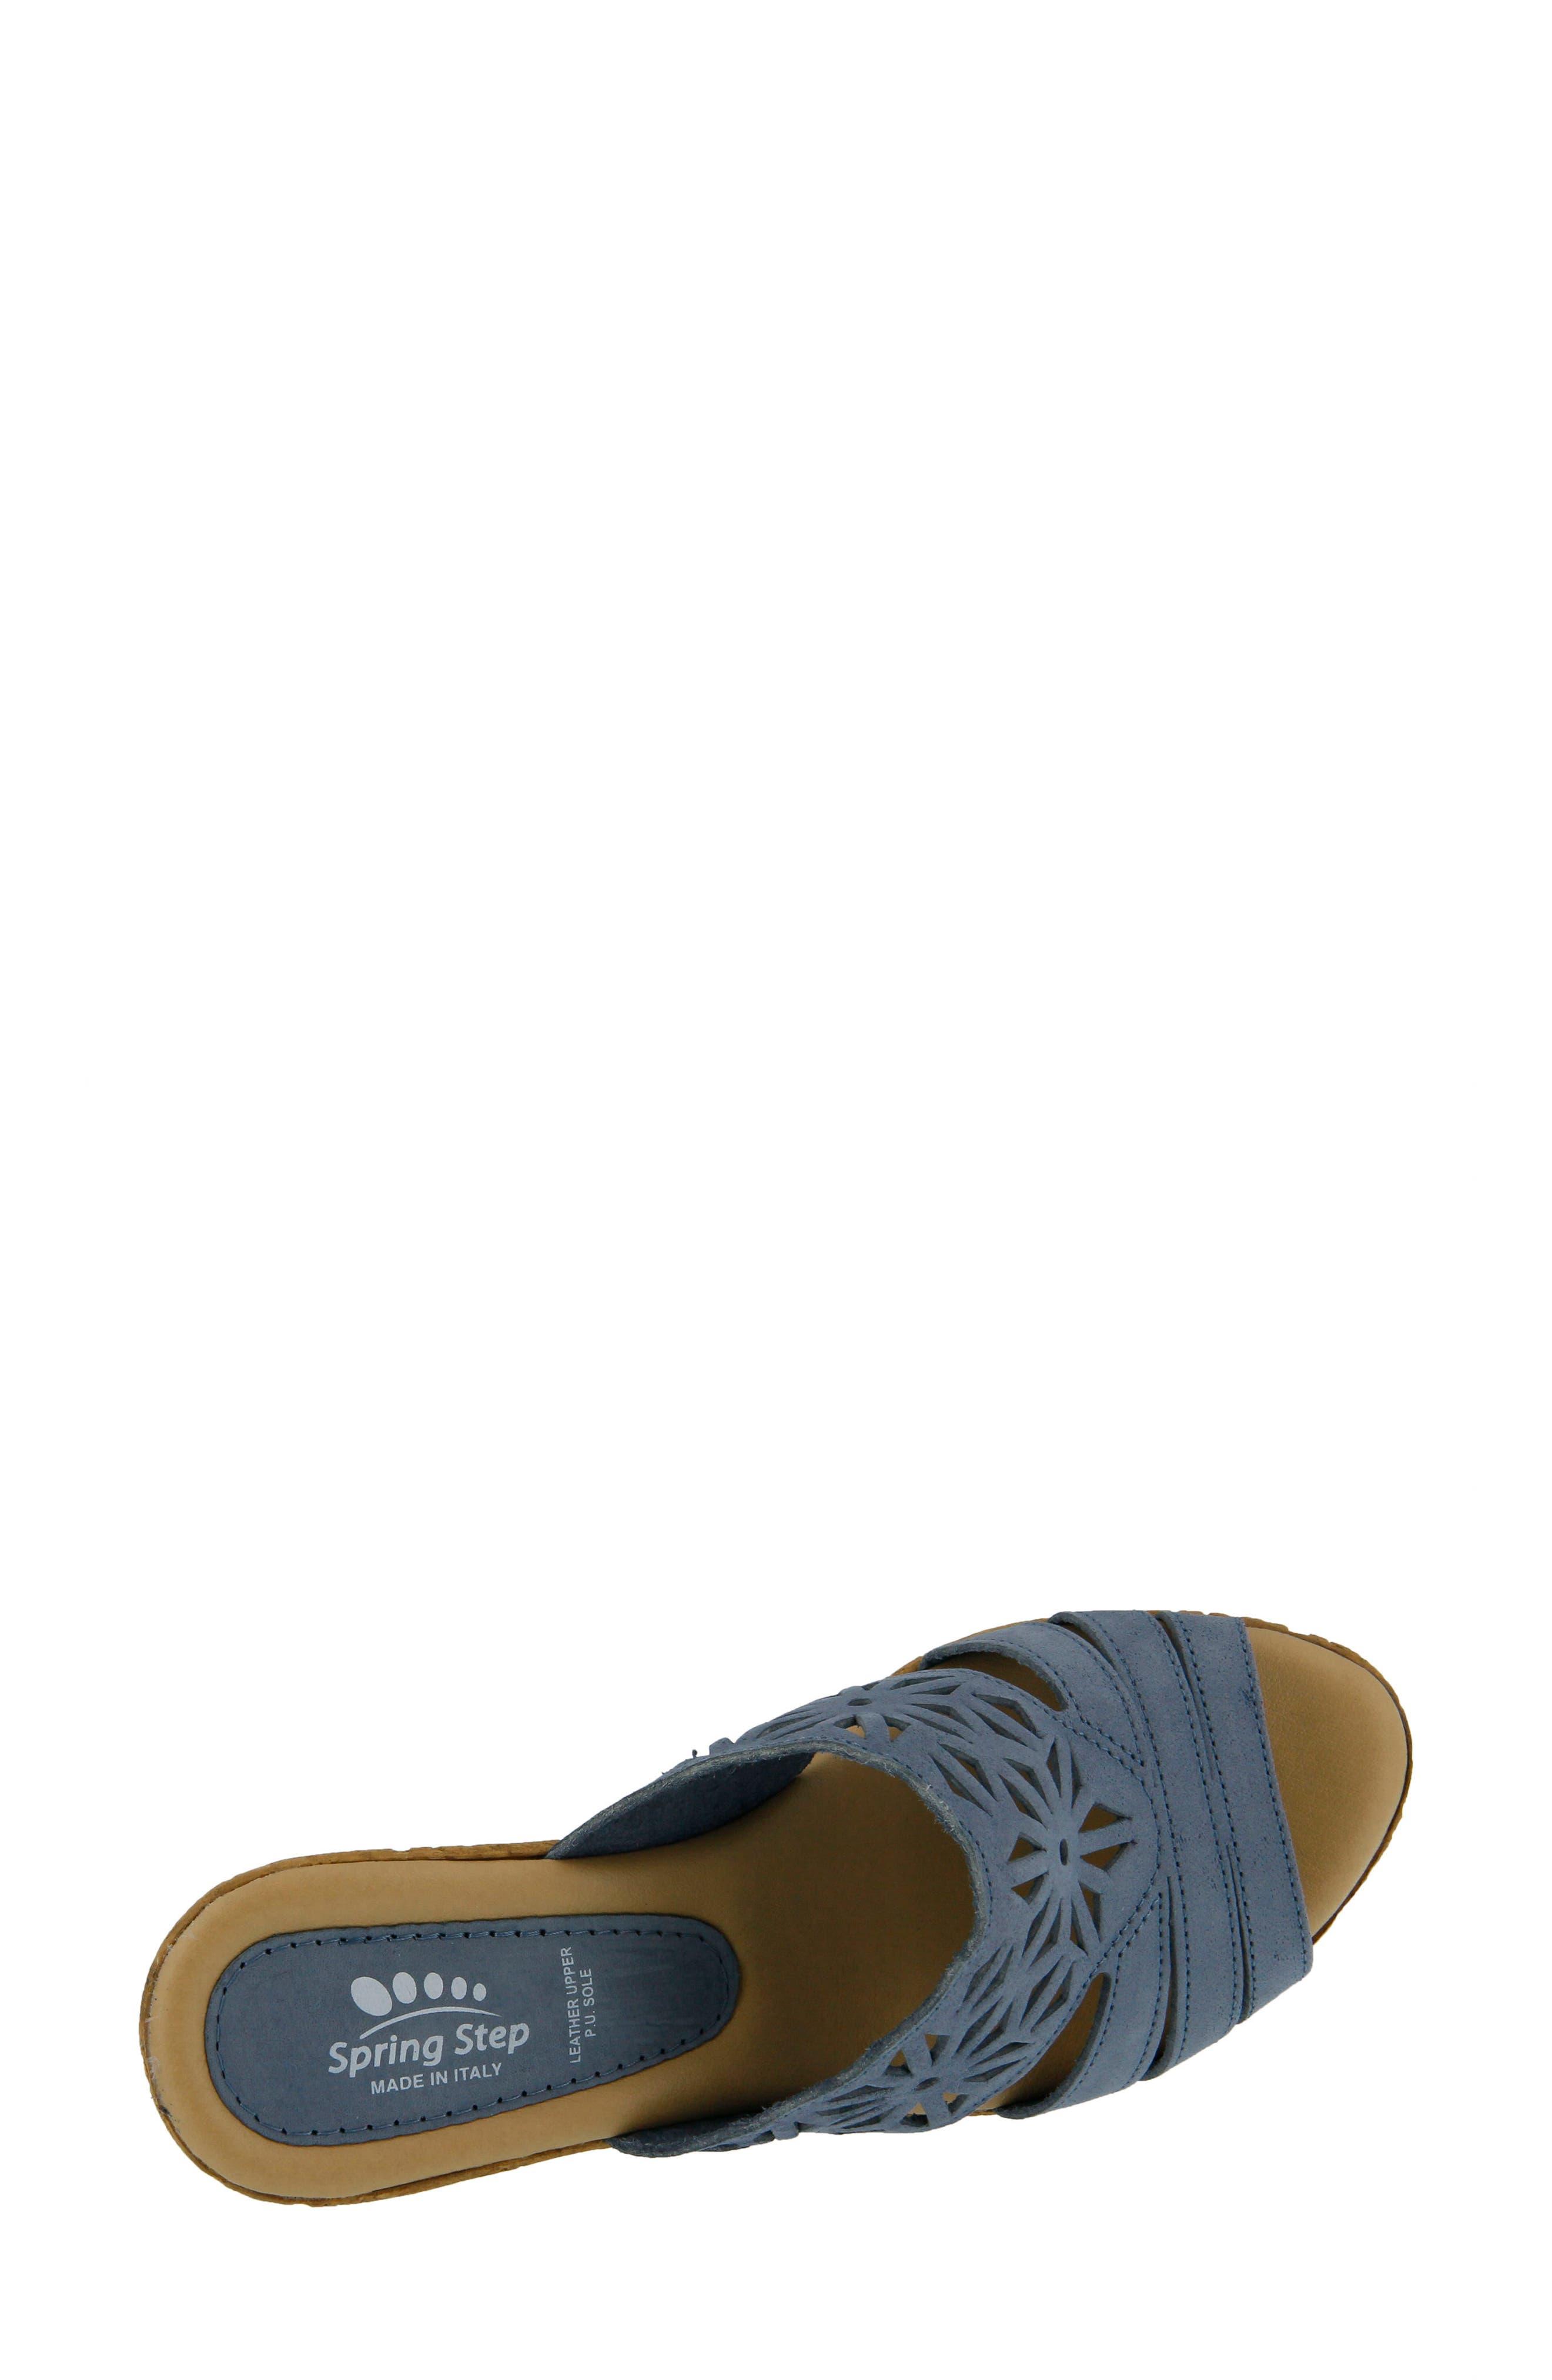 Dora Wedge Sandal,                             Alternate thumbnail 4, color,                             Blue Nubuck